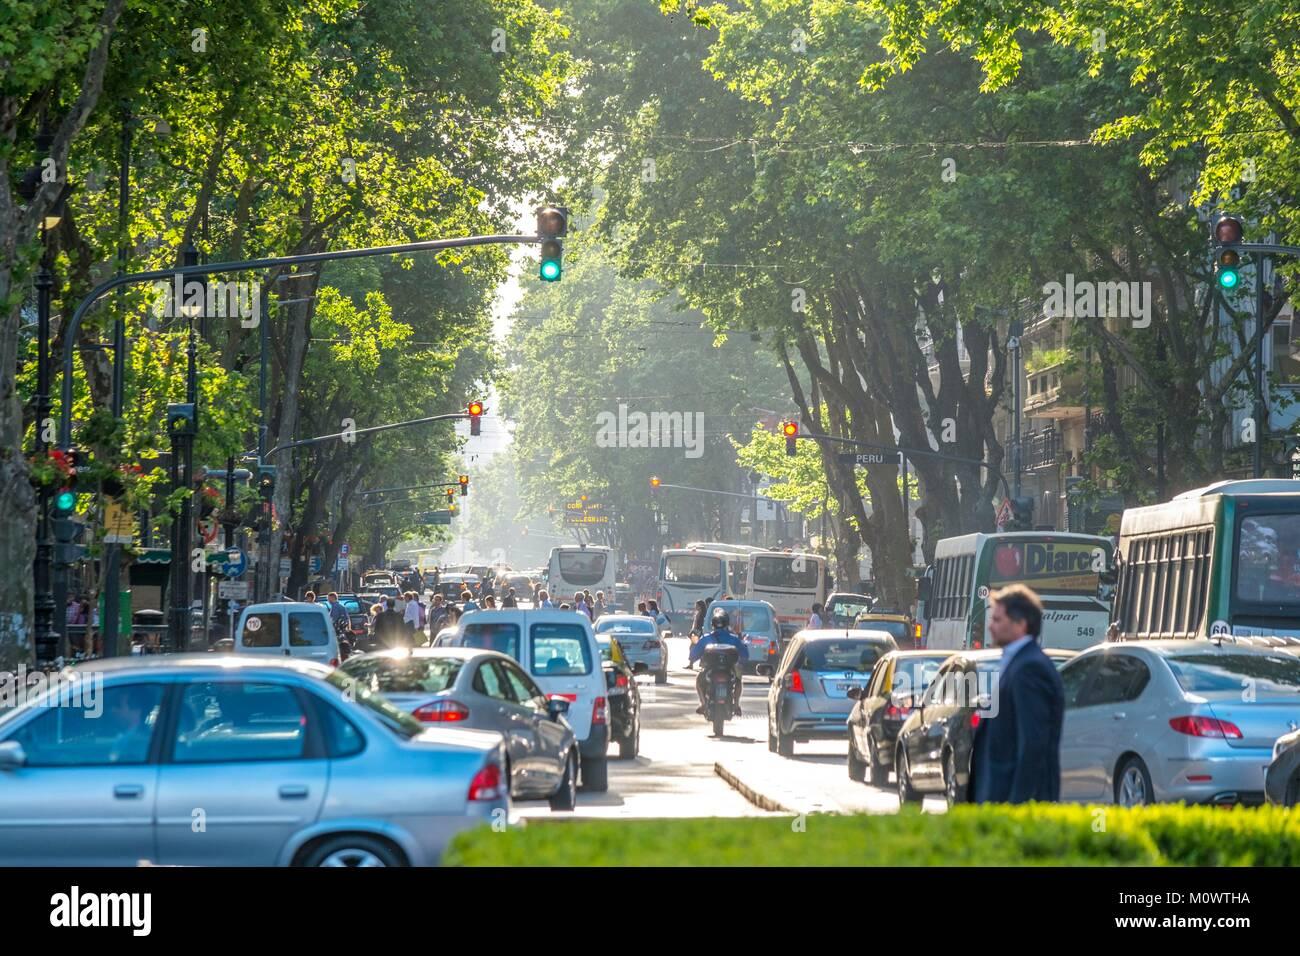 Argentinien, Provinz Buenos Aires, Buenos Aires, Avenida de Mayo Stockbild